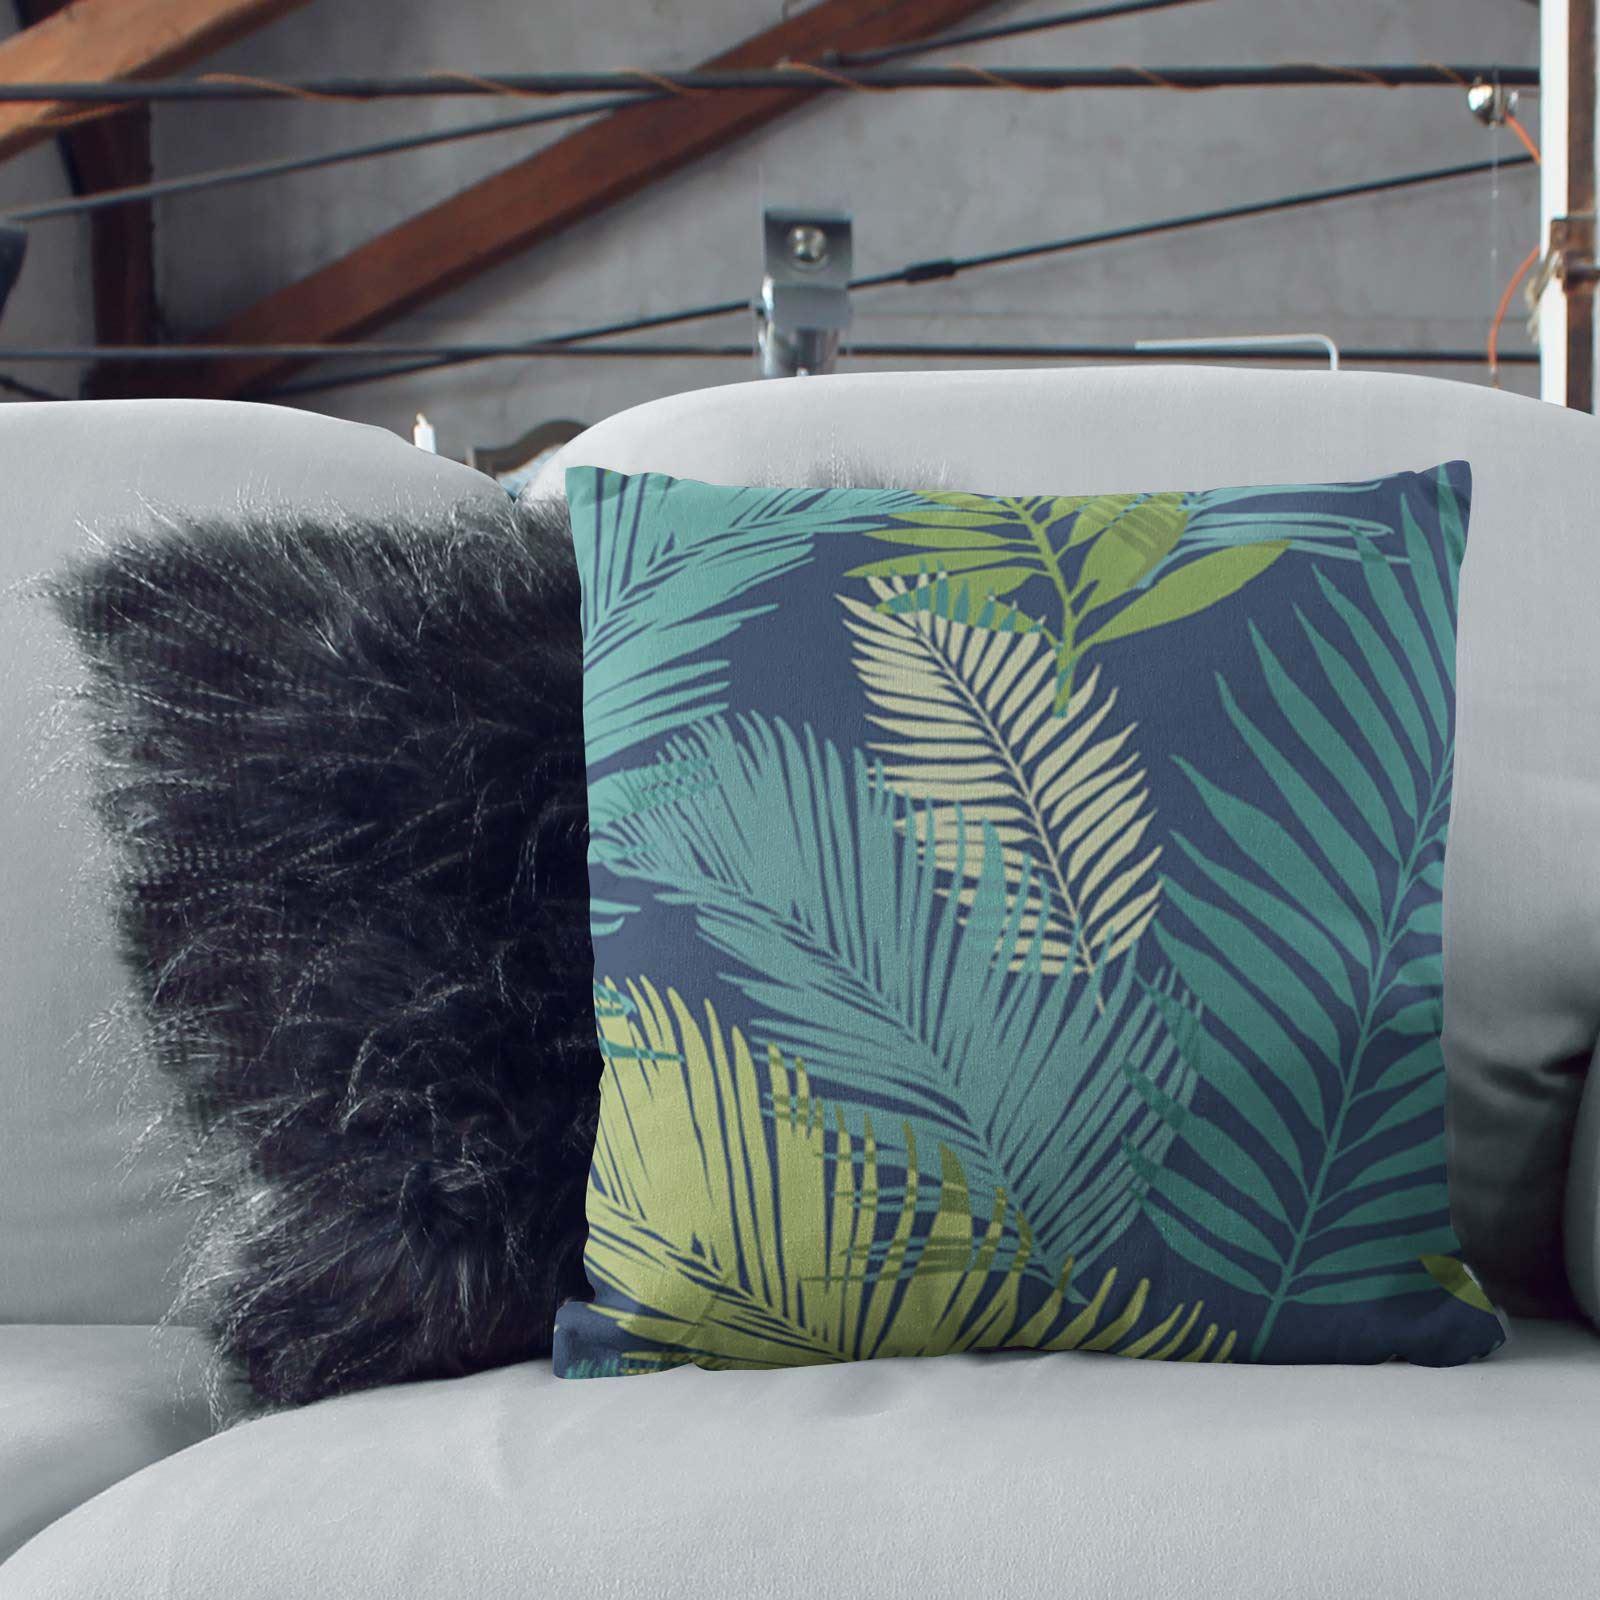 Teal-Blue-Duck-Egg-Cushion-Covers-18-034-x18-034-45cm-x-45cm-Luxury-Cover thumbnail 7